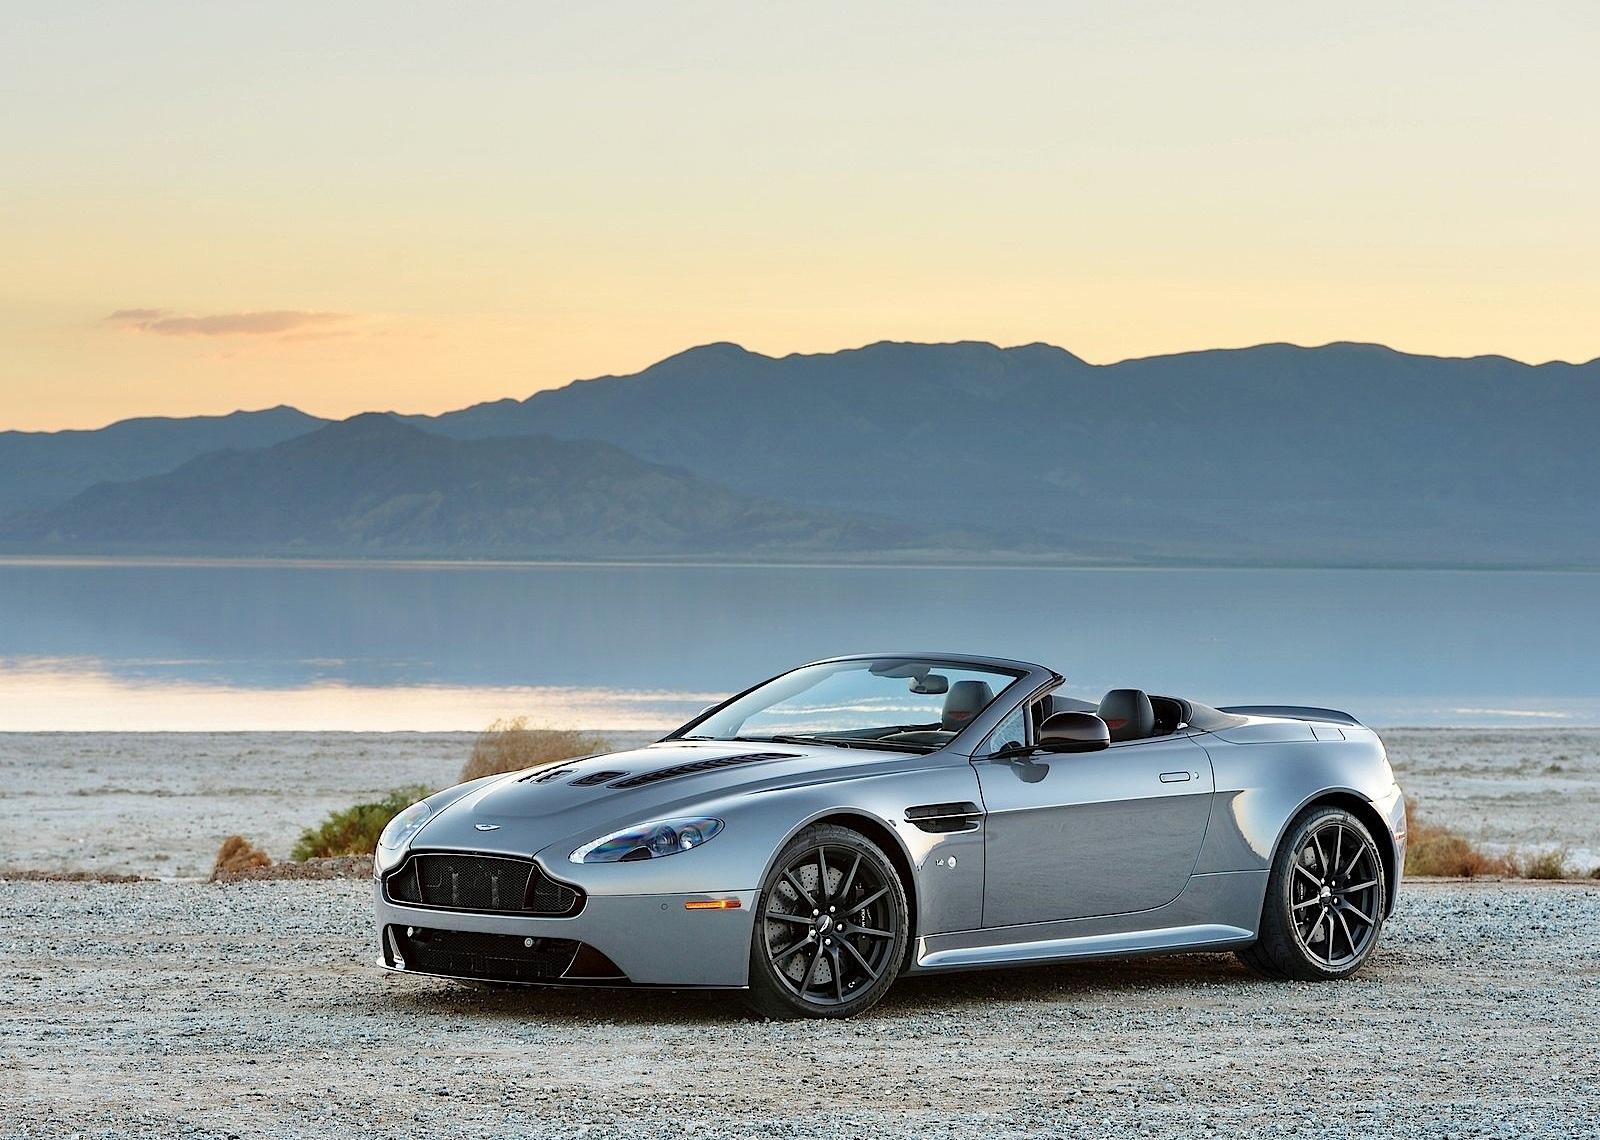 Aston martin v12 vantage s roadster 2014 present